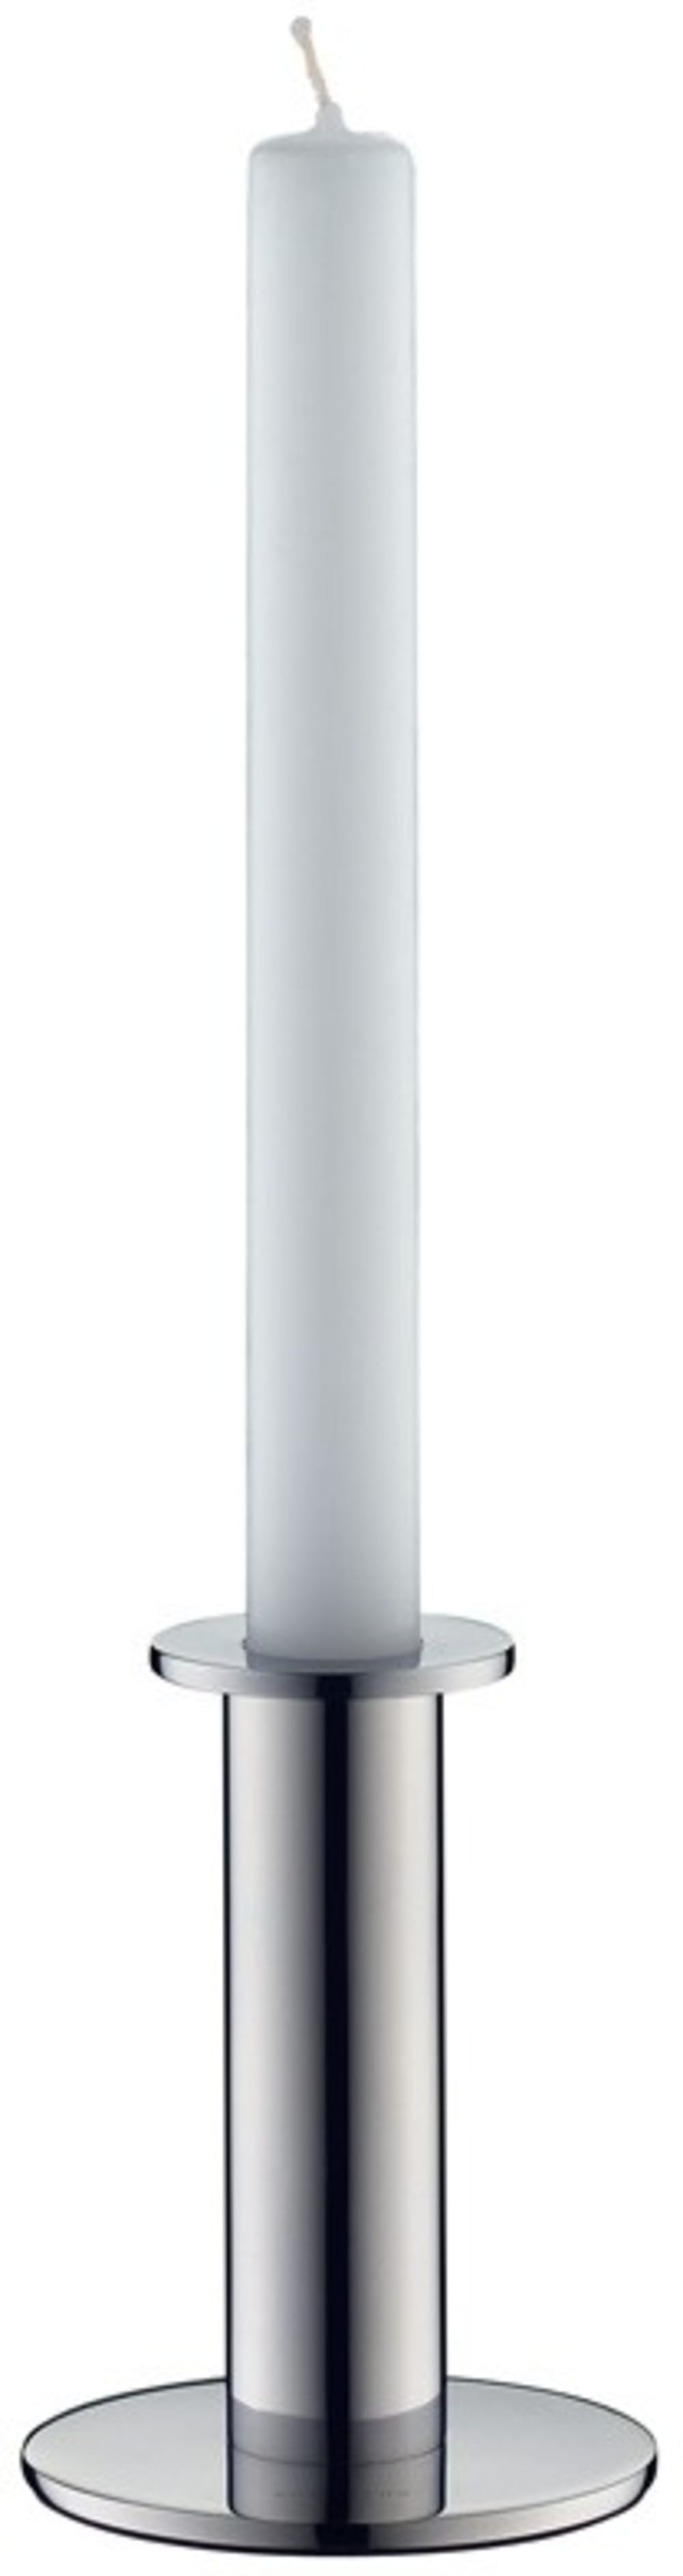 Auerhahn-TUBE świecznik+świeca,mat H10cm, bez opak